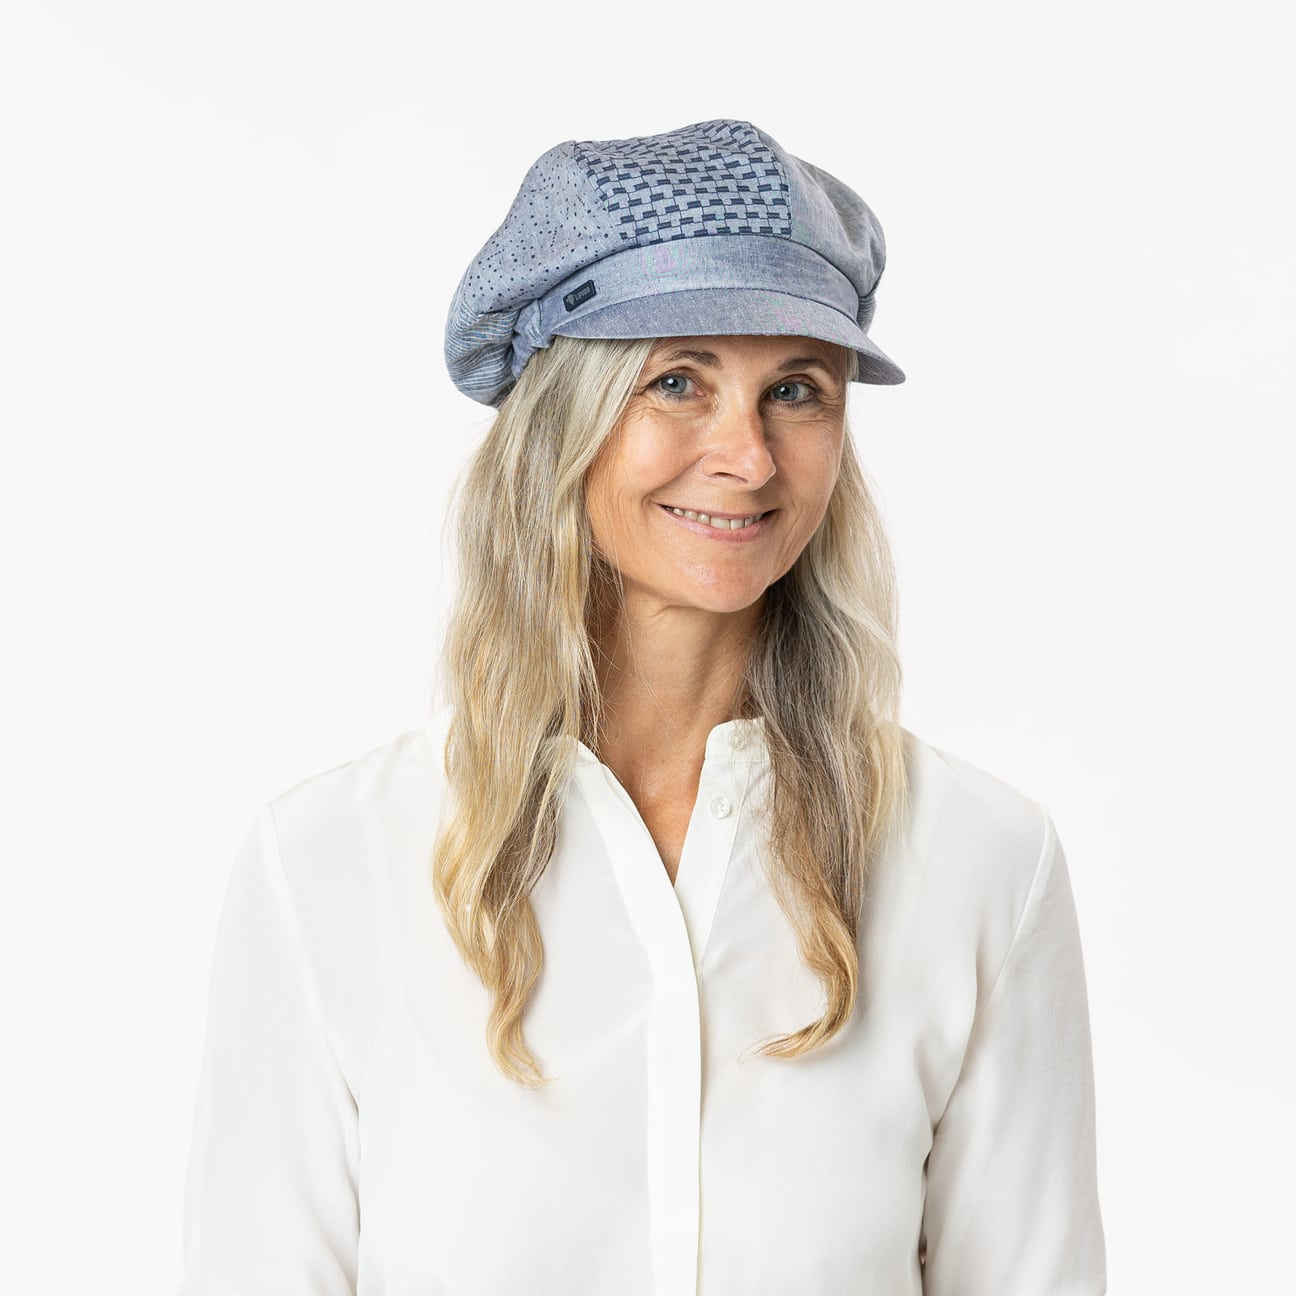 Lipodo Avella Cotton Newsboy Cap Women Made in Italy